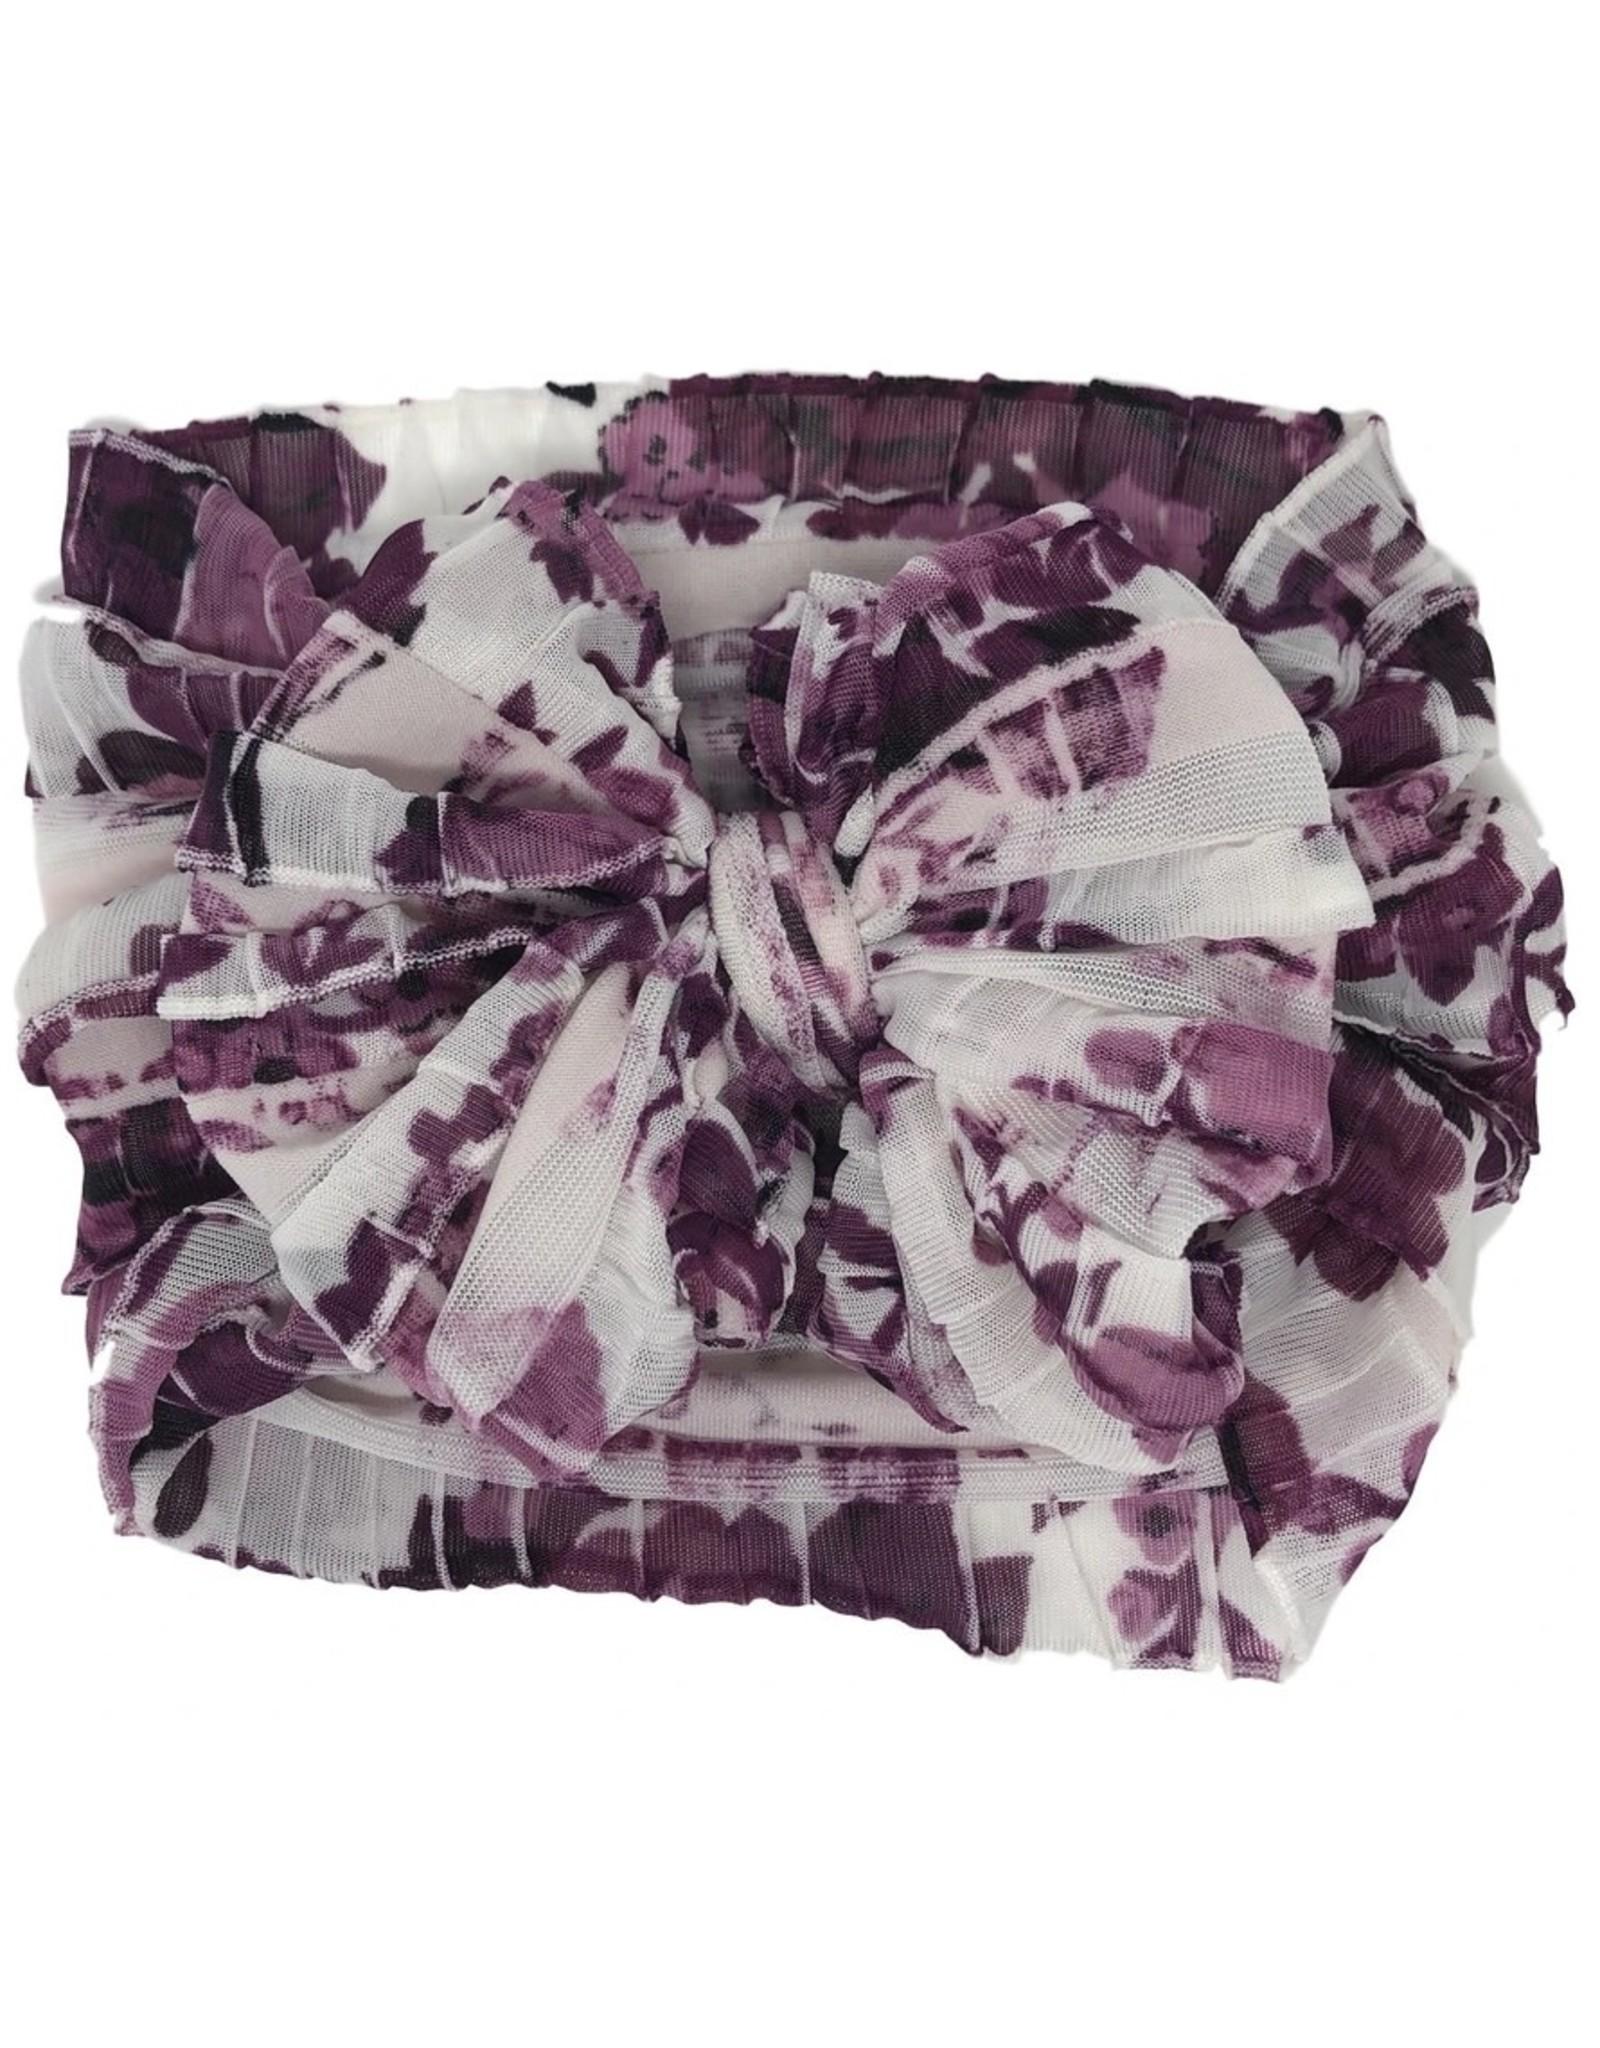 In Awe- Plum Floral Headband